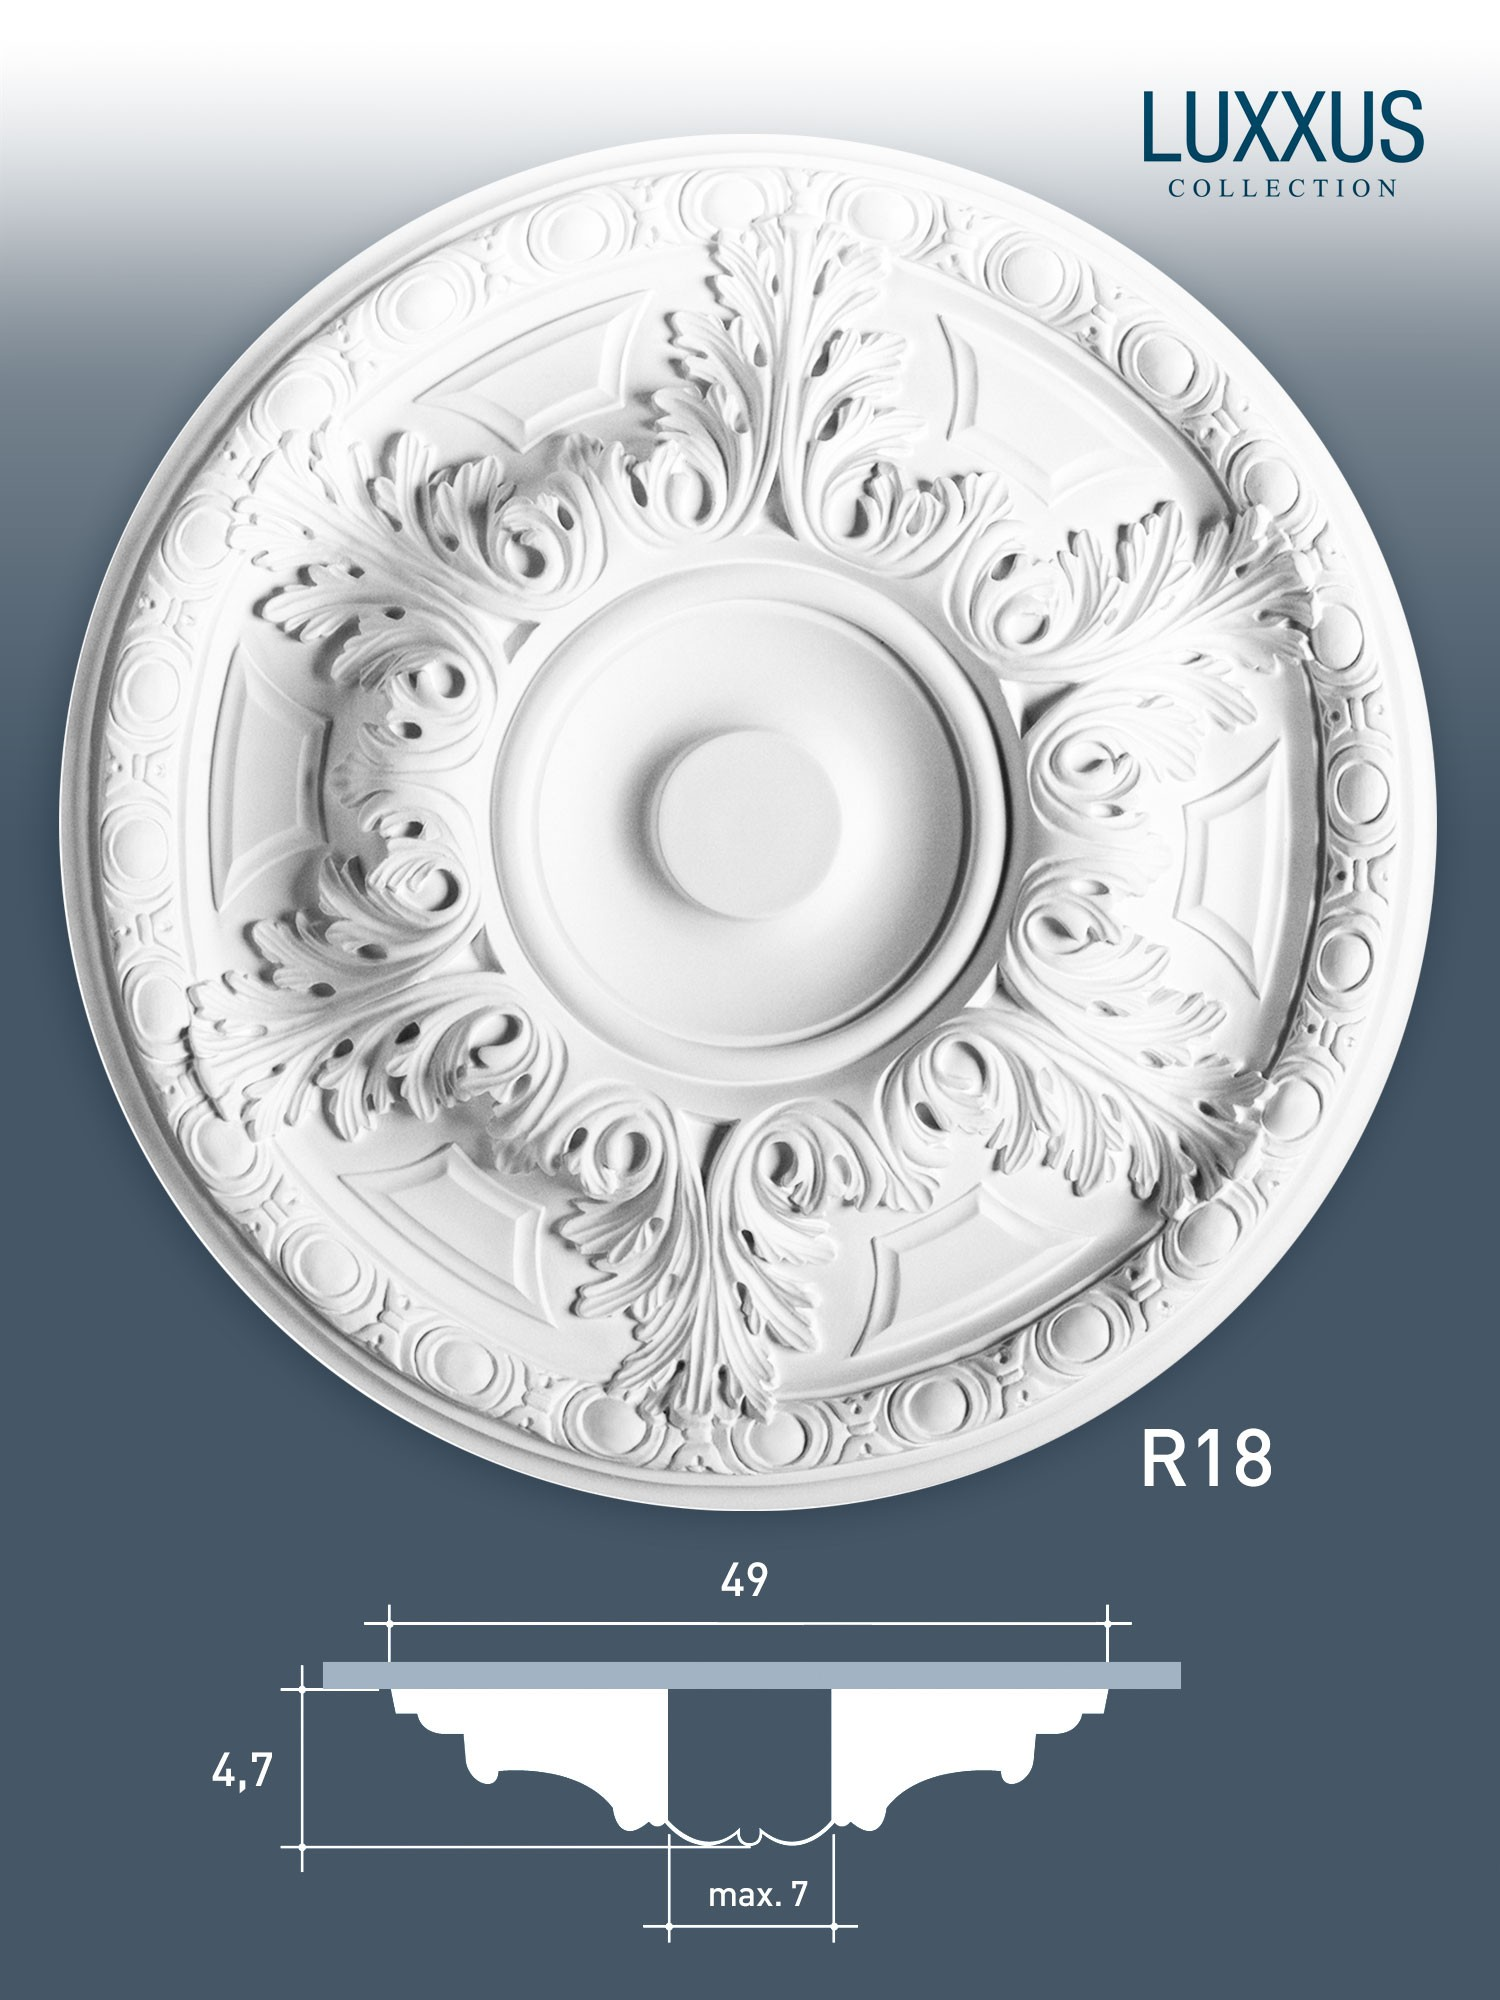 deckenrosette medallion orac decor r18 luxxus lampen rosette stuckrosette 49 cm original orac. Black Bedroom Furniture Sets. Home Design Ideas